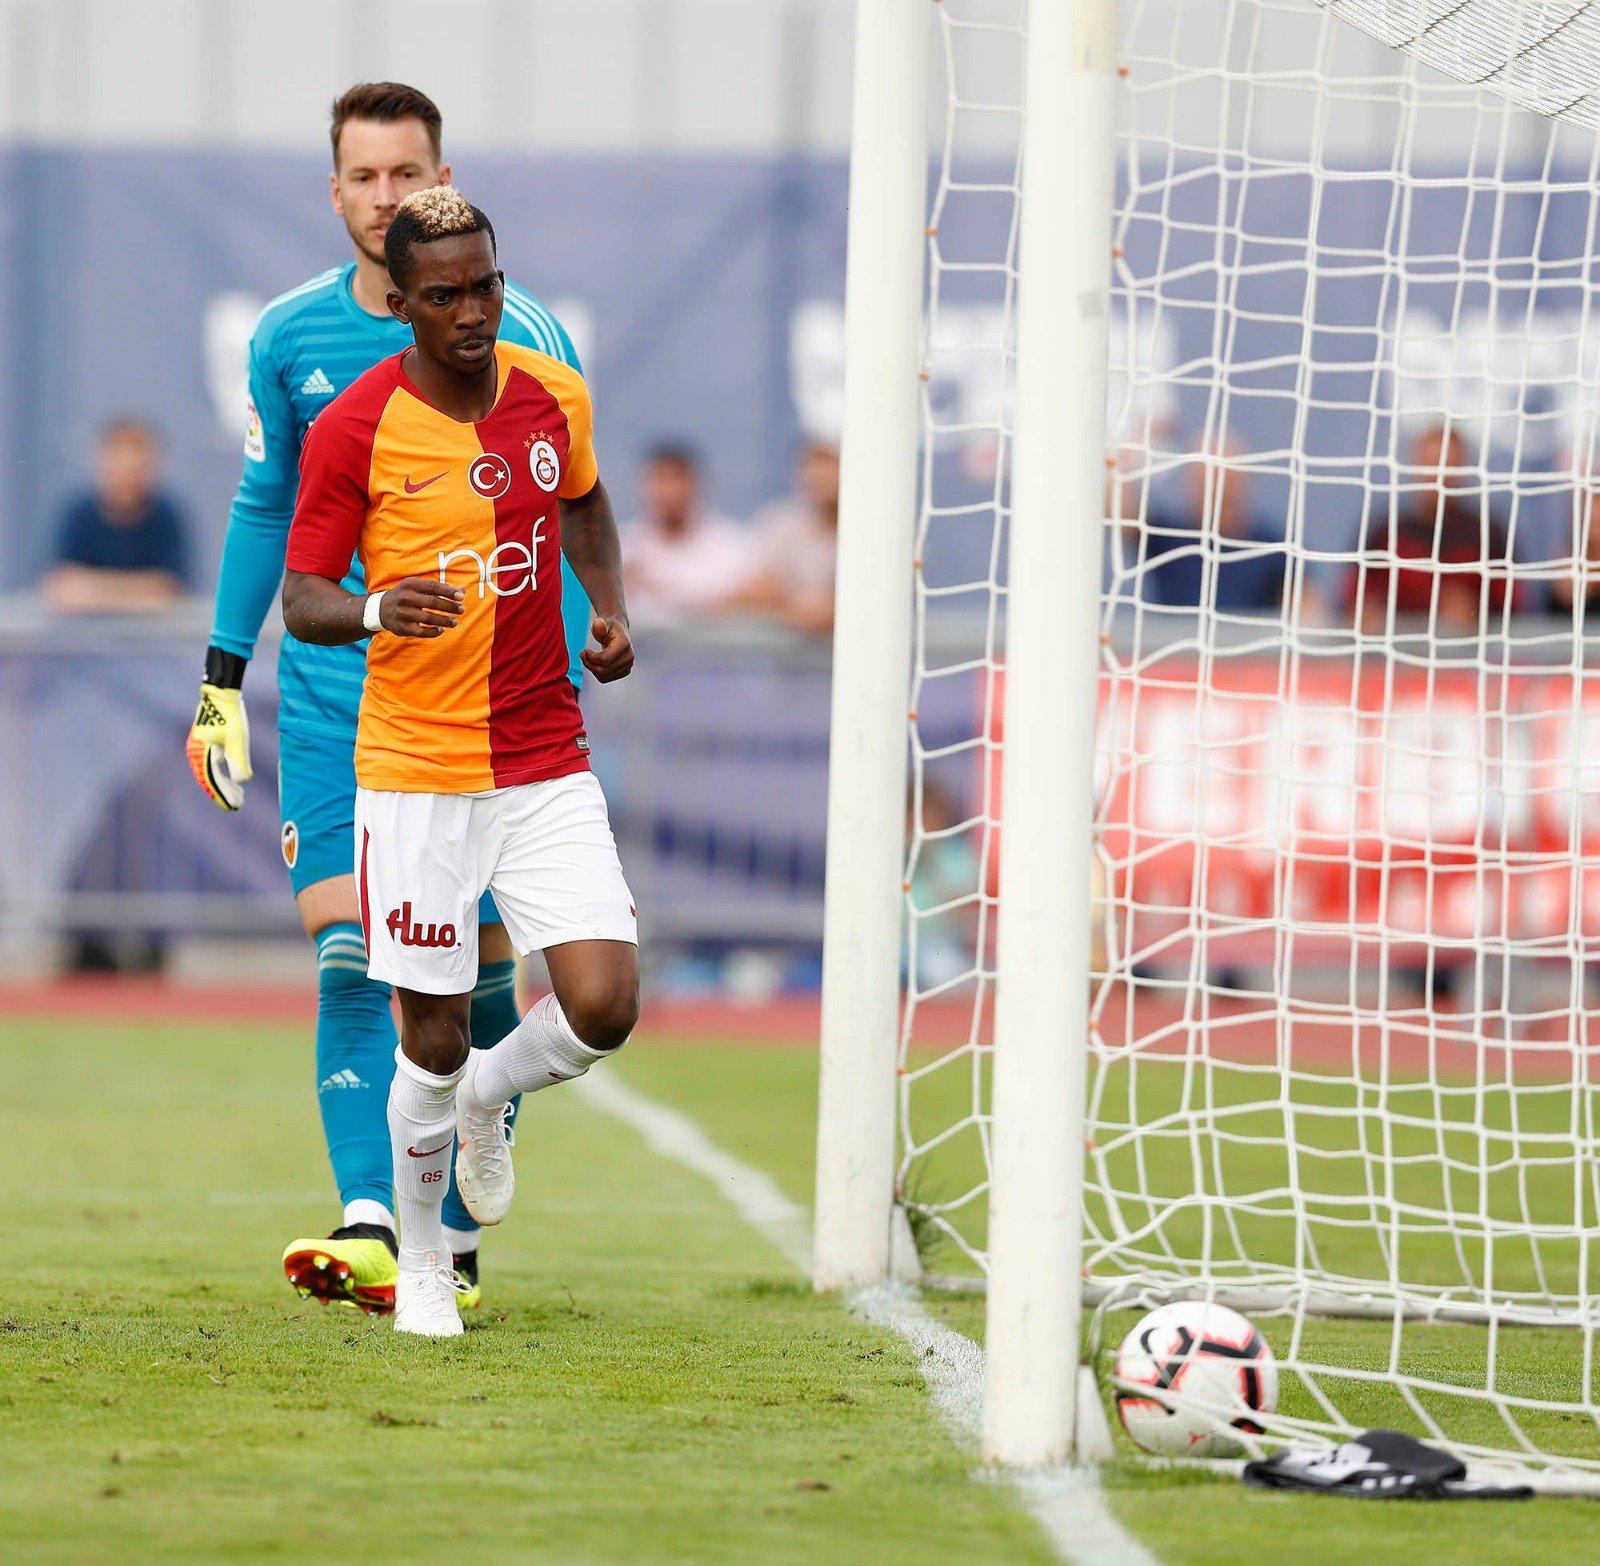 Onyekuru Happy To Bag First Galatasaray Goal, Eager To Score Regularly